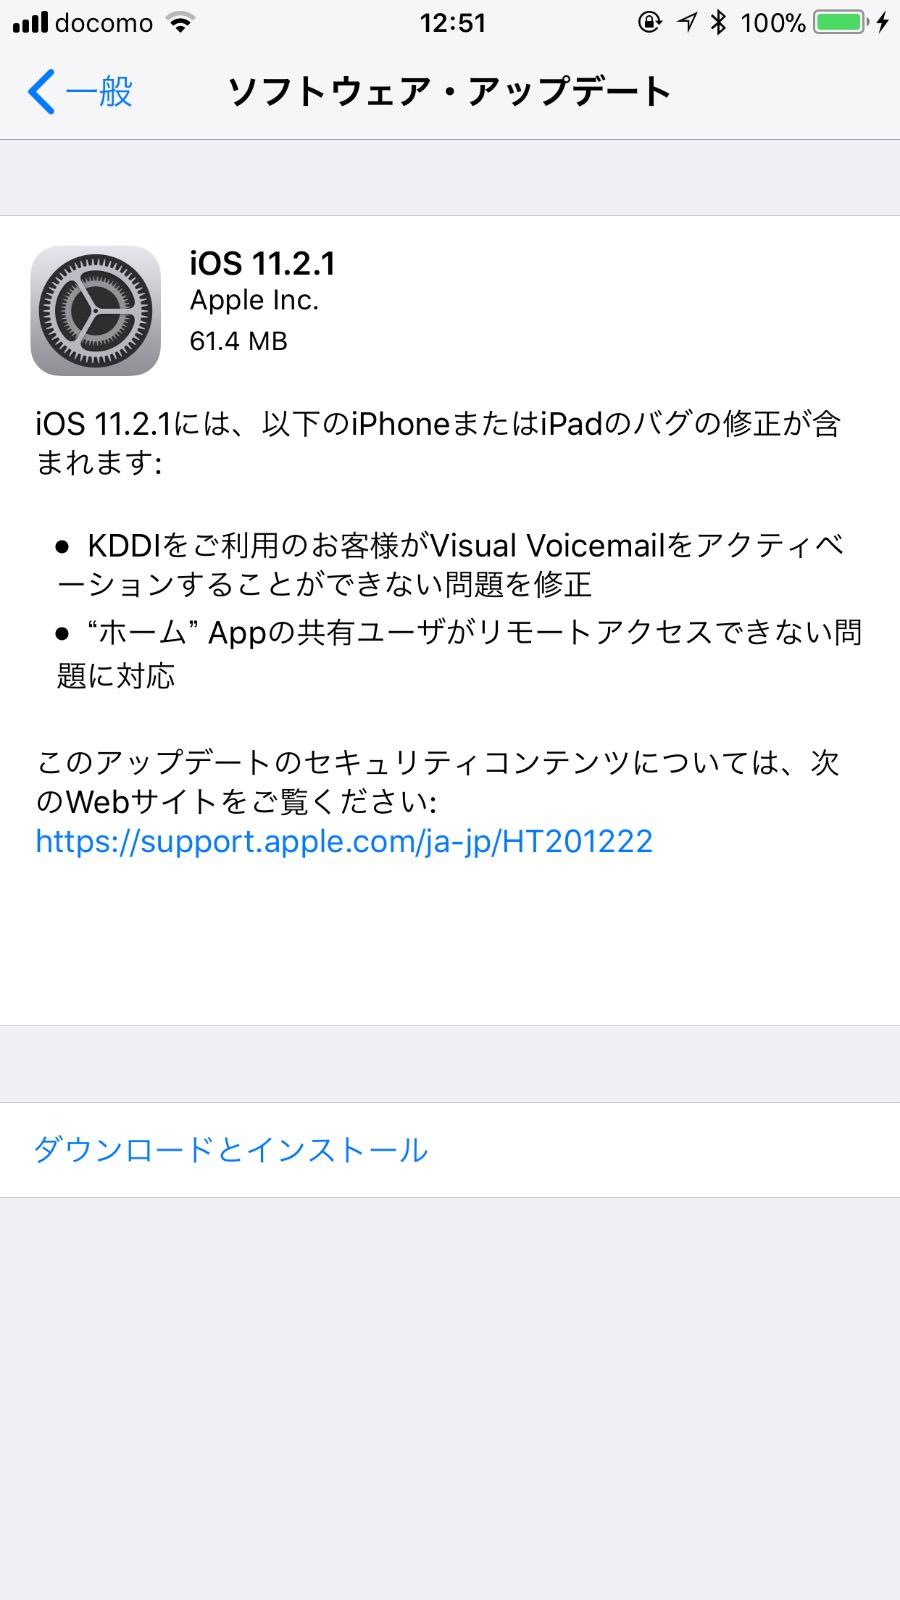 【iOS 11】「iOS 11.2.1 ソフトウェア・アップデート」リリース